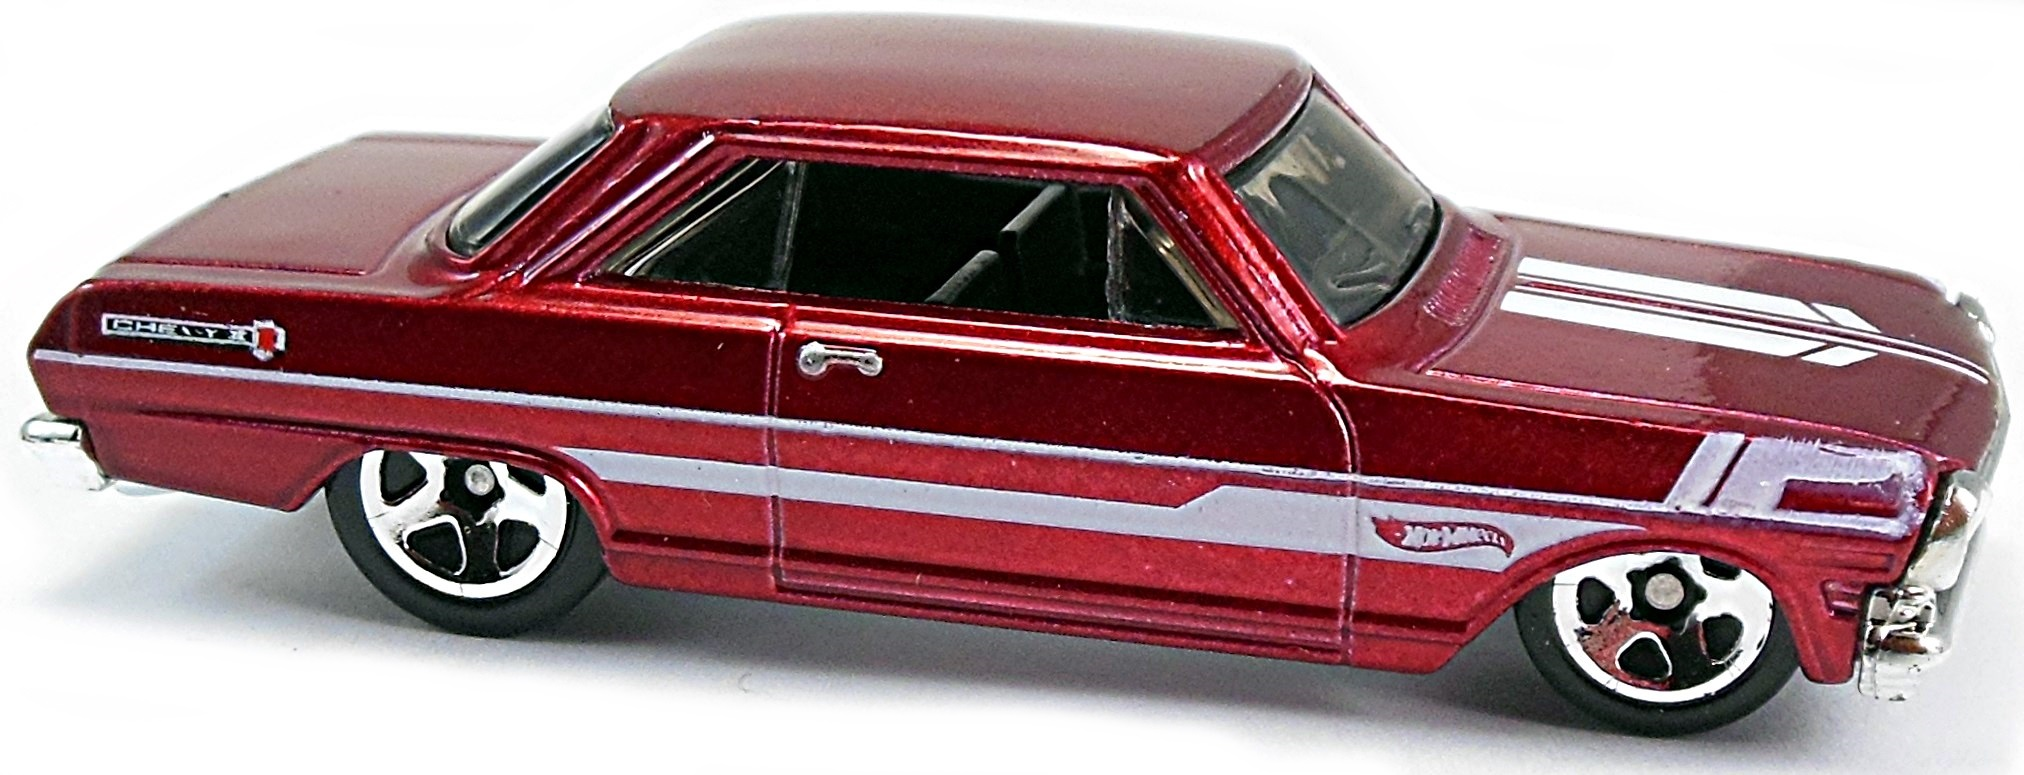 63 Chevy II - 75mm - 2016 | Hot Wheels Newsletter